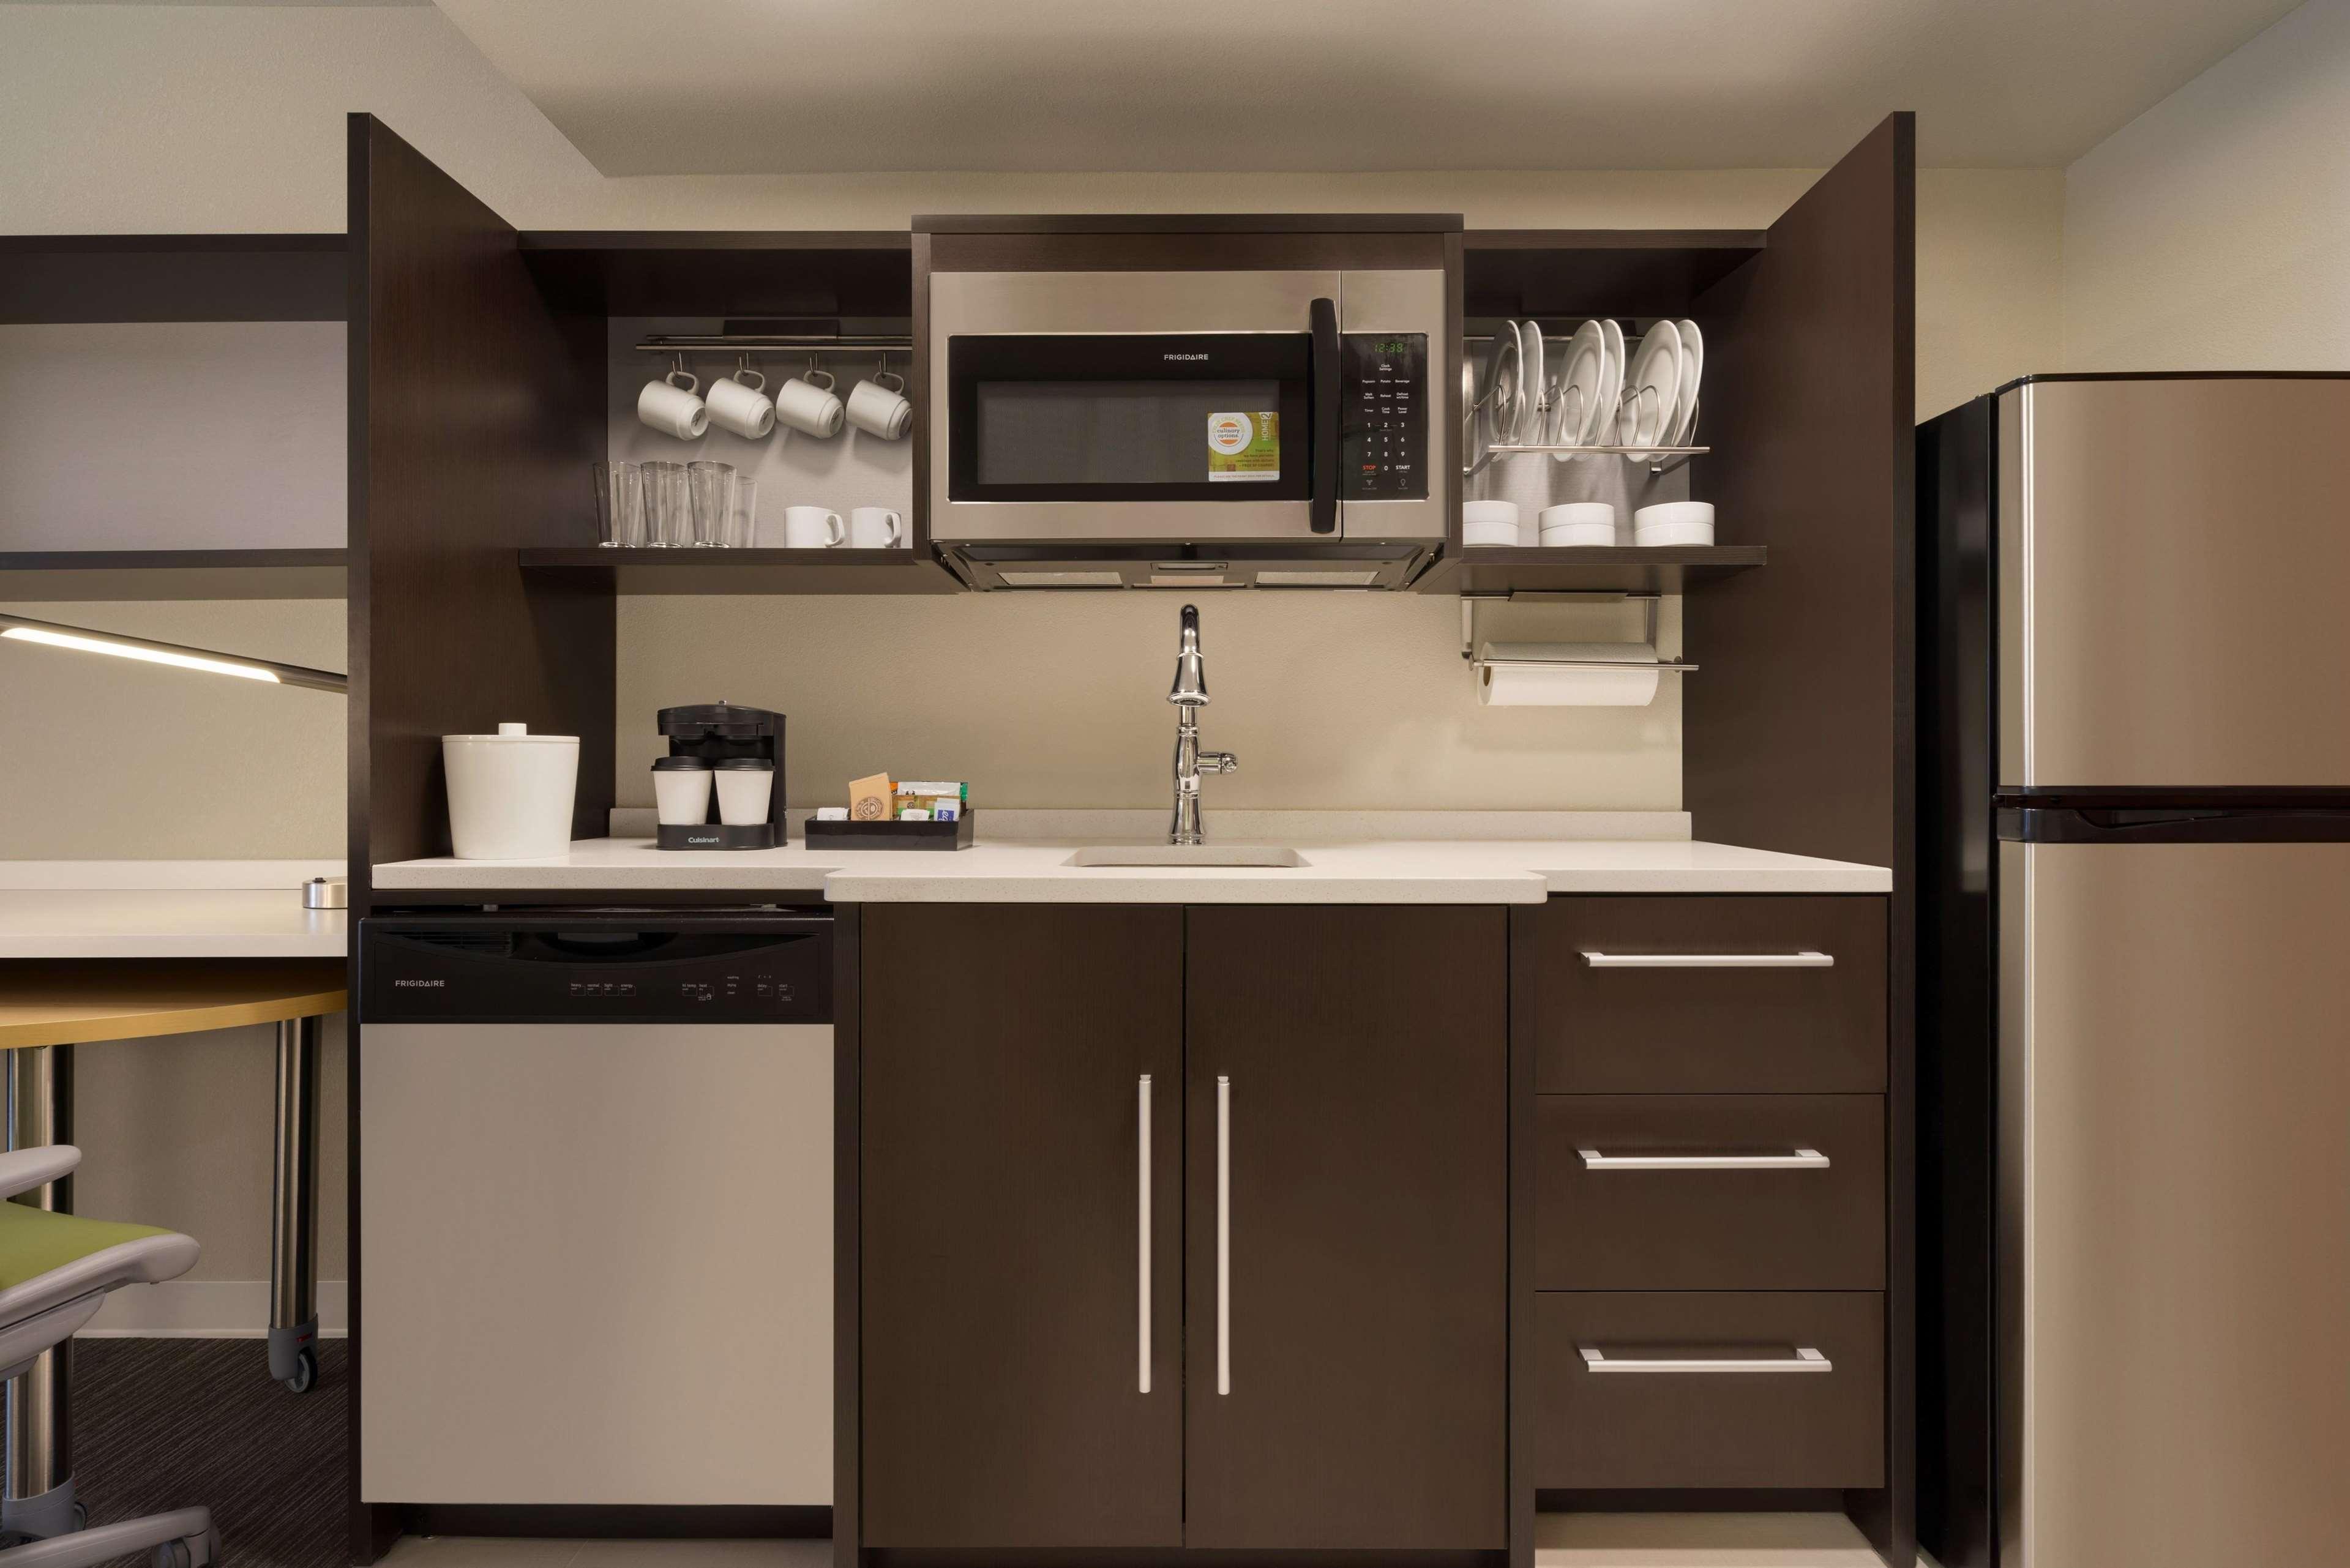 Home2 Suites by Hilton Leavenworth Downtown image 24